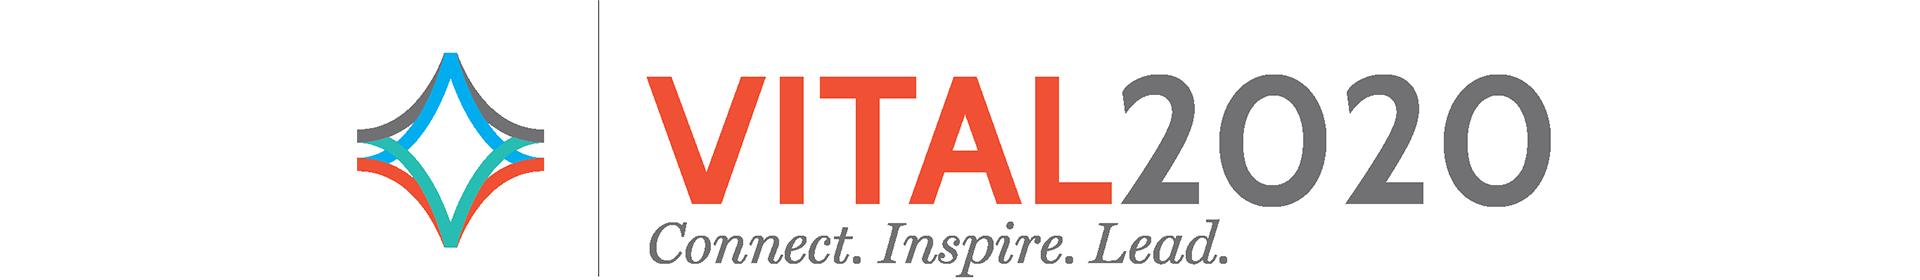 VITAL2020 Event Banner